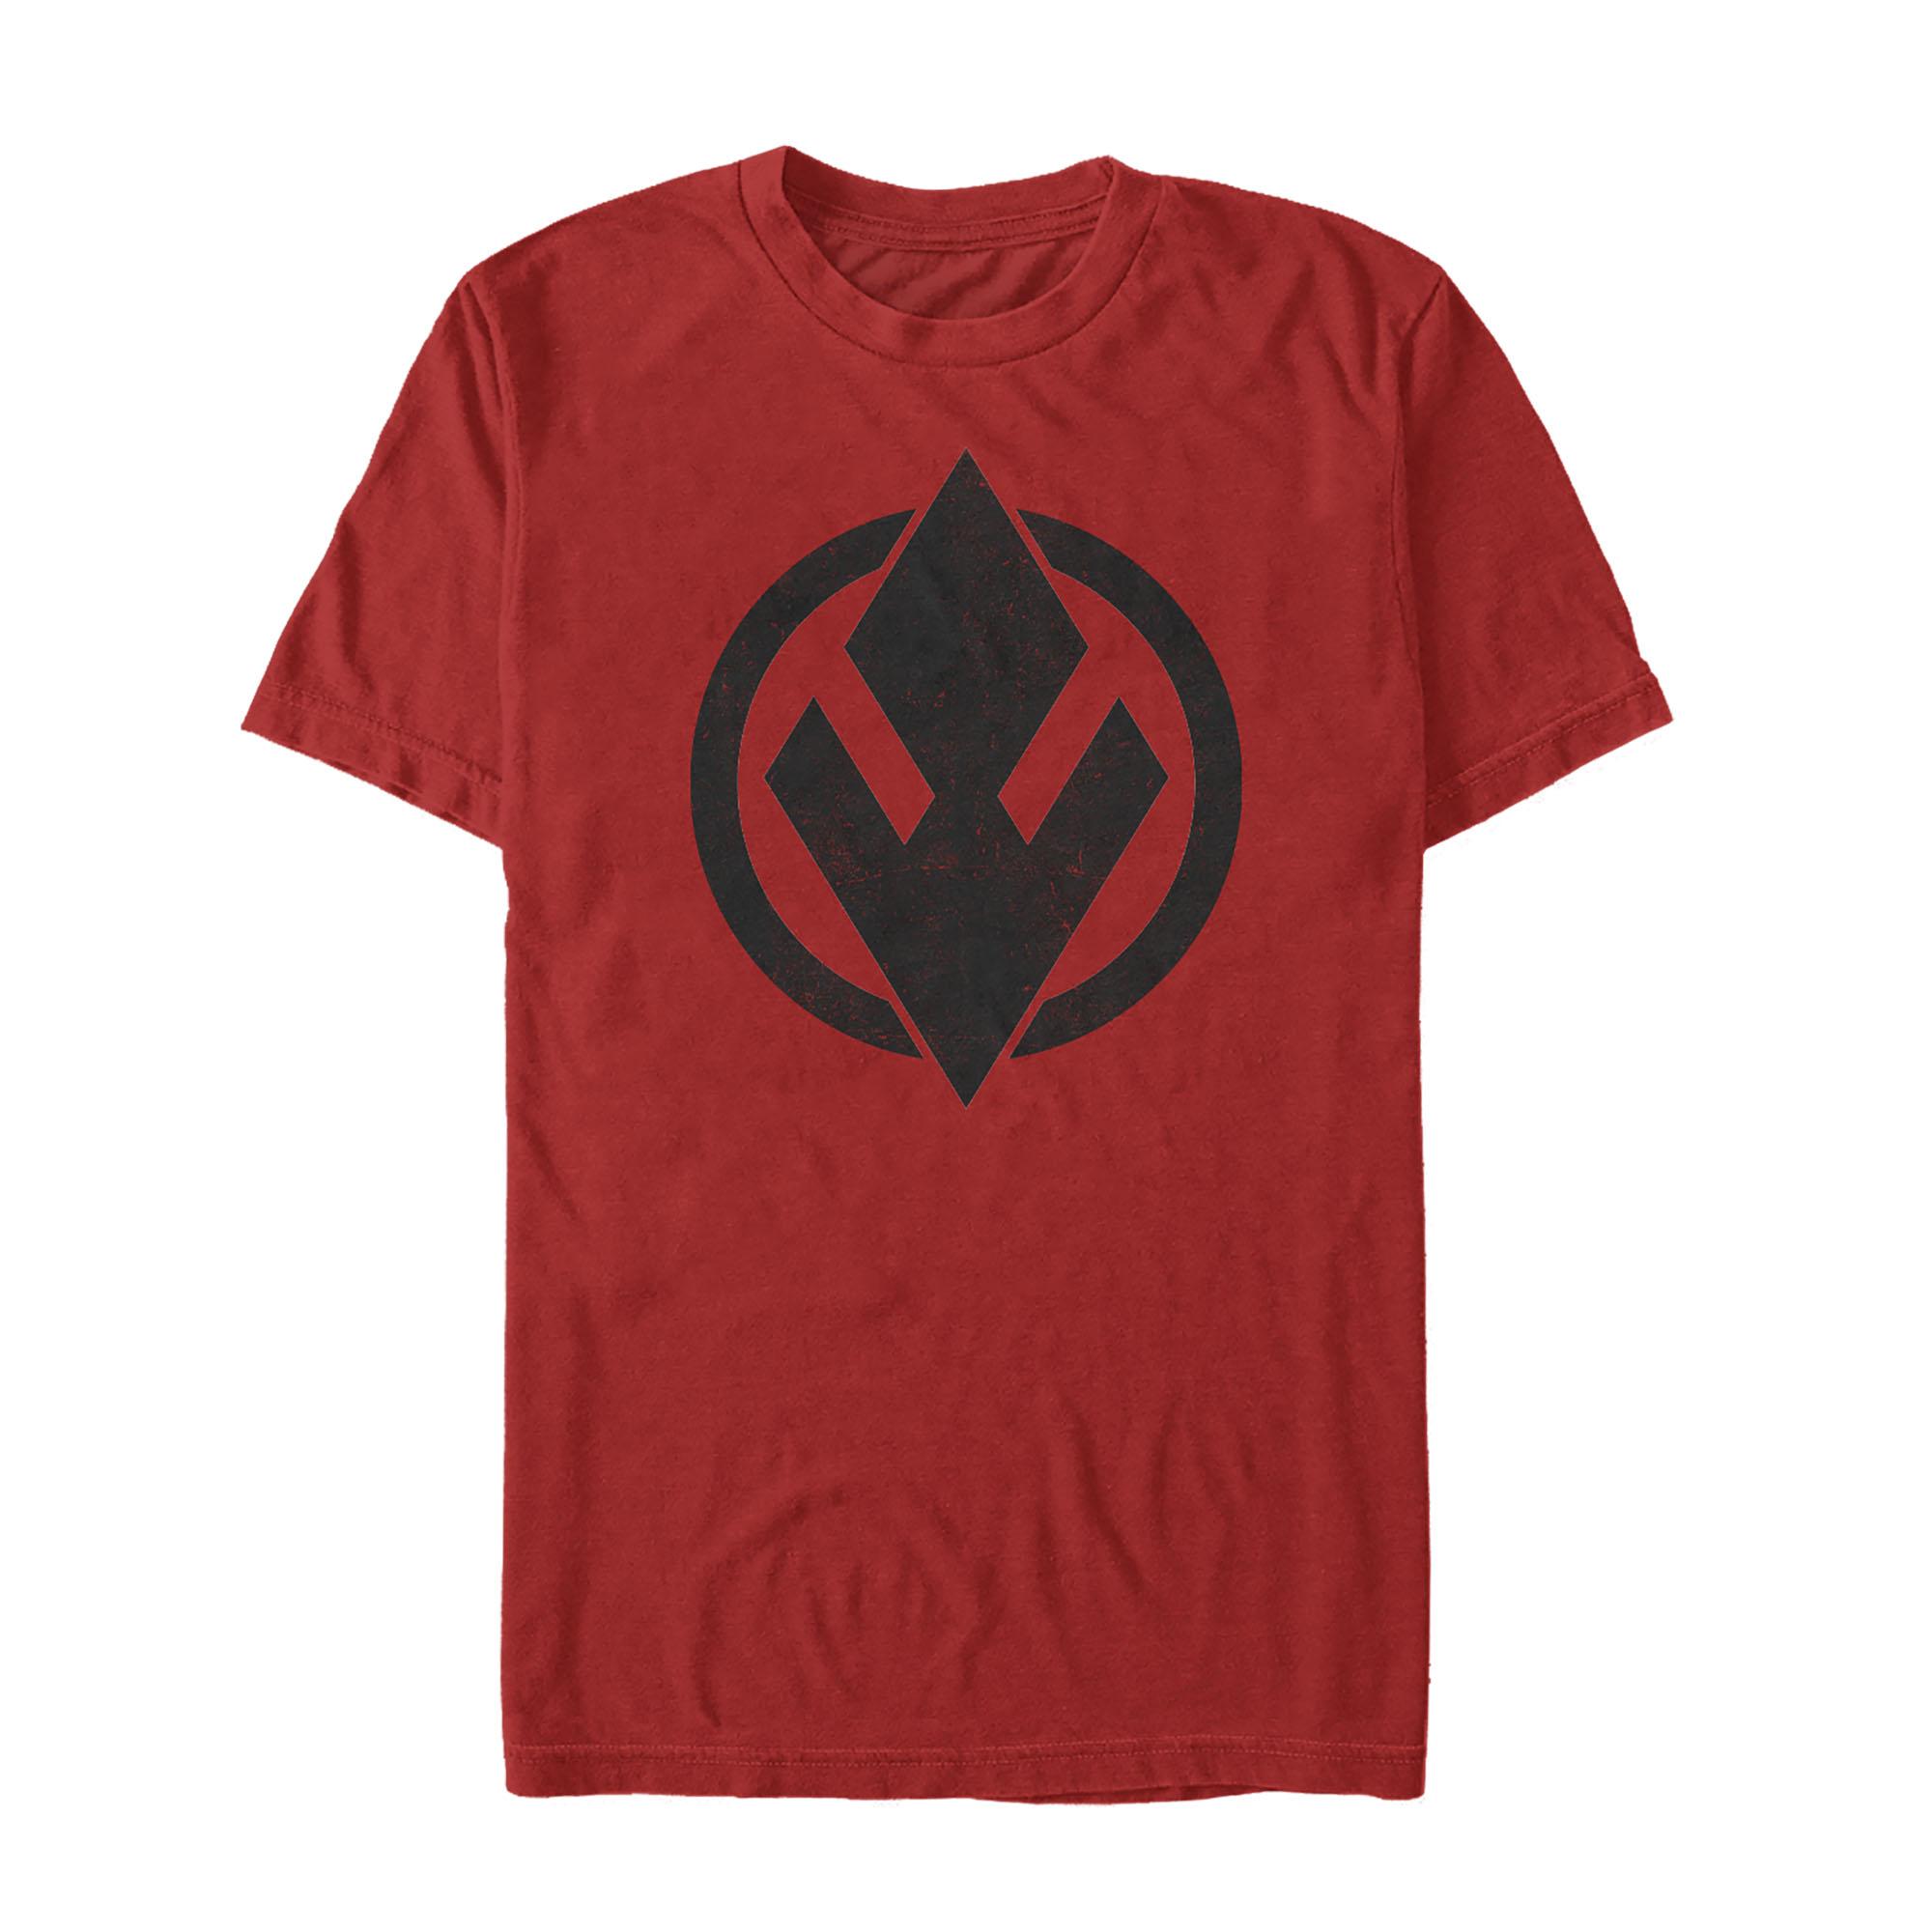 TROS Sith Trooper Logo T-Shirt